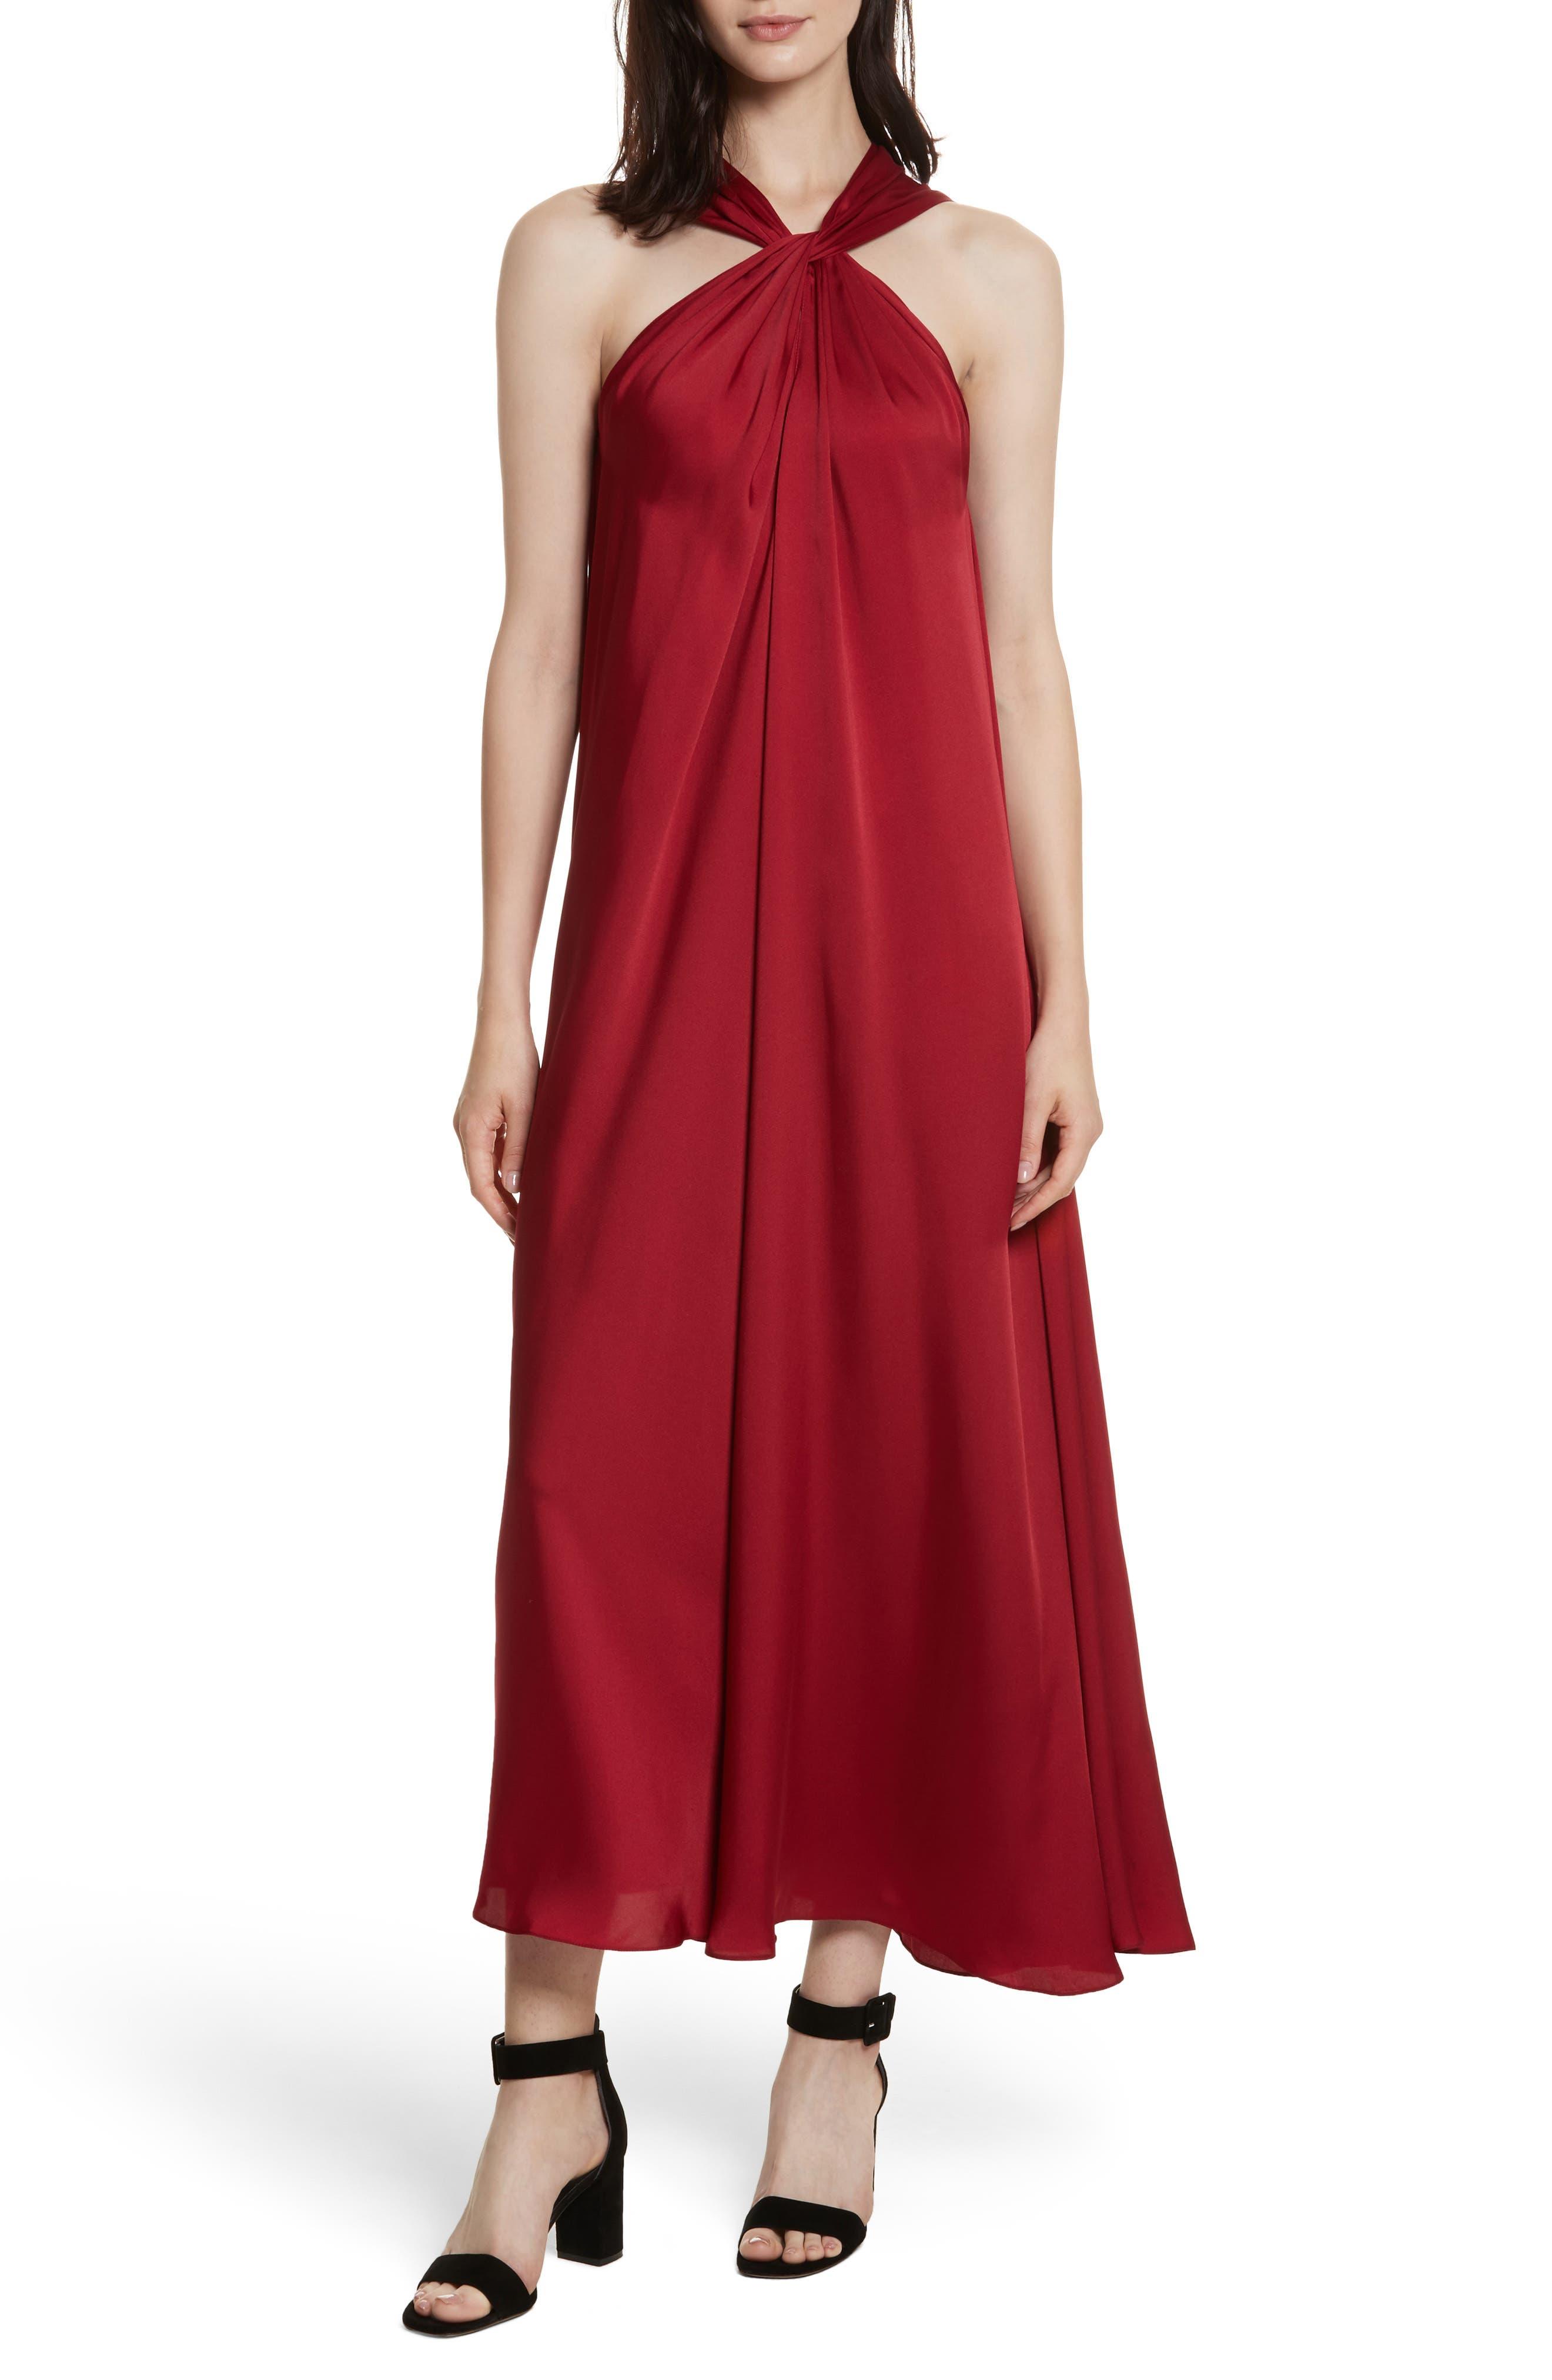 Cavan Twist Neck Satin Dress,                         Main,                         color, Ruby